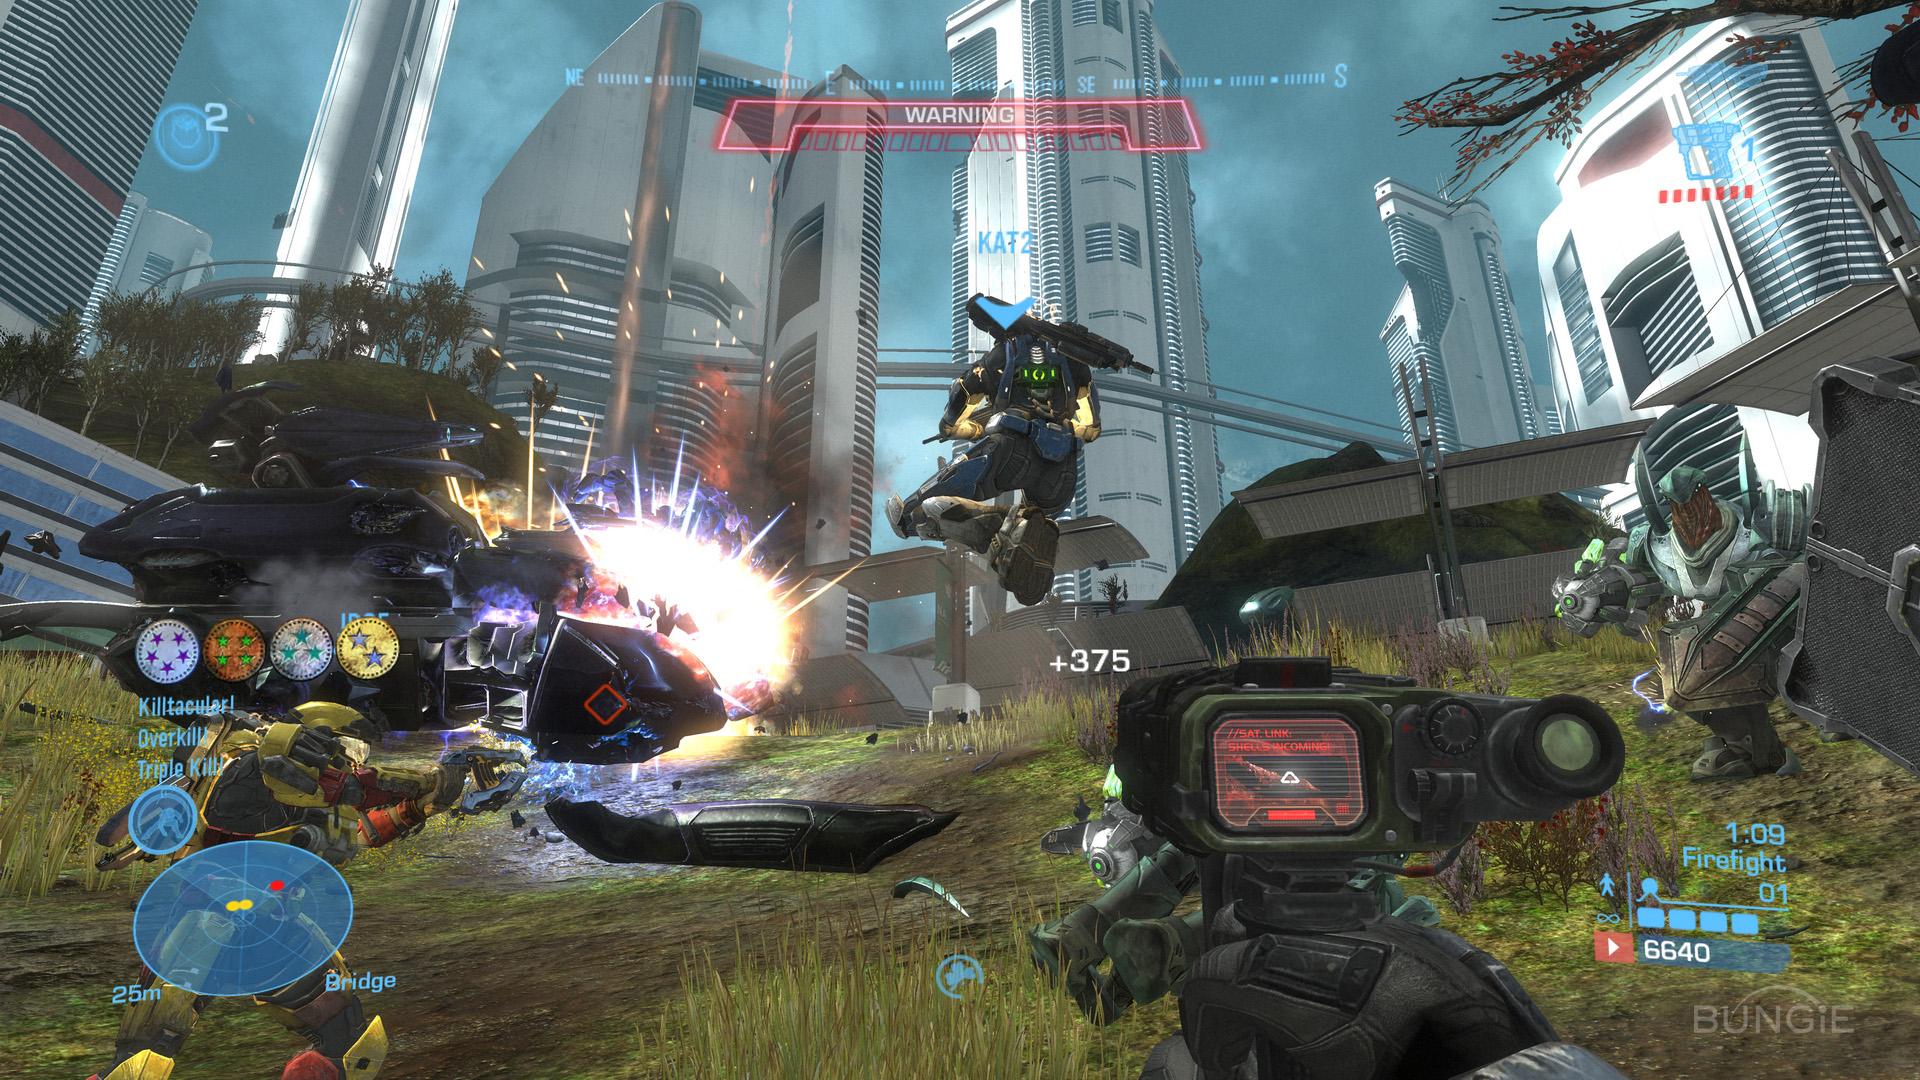 Fichier:Halo- Reach - Firefight Beachhead.jpg